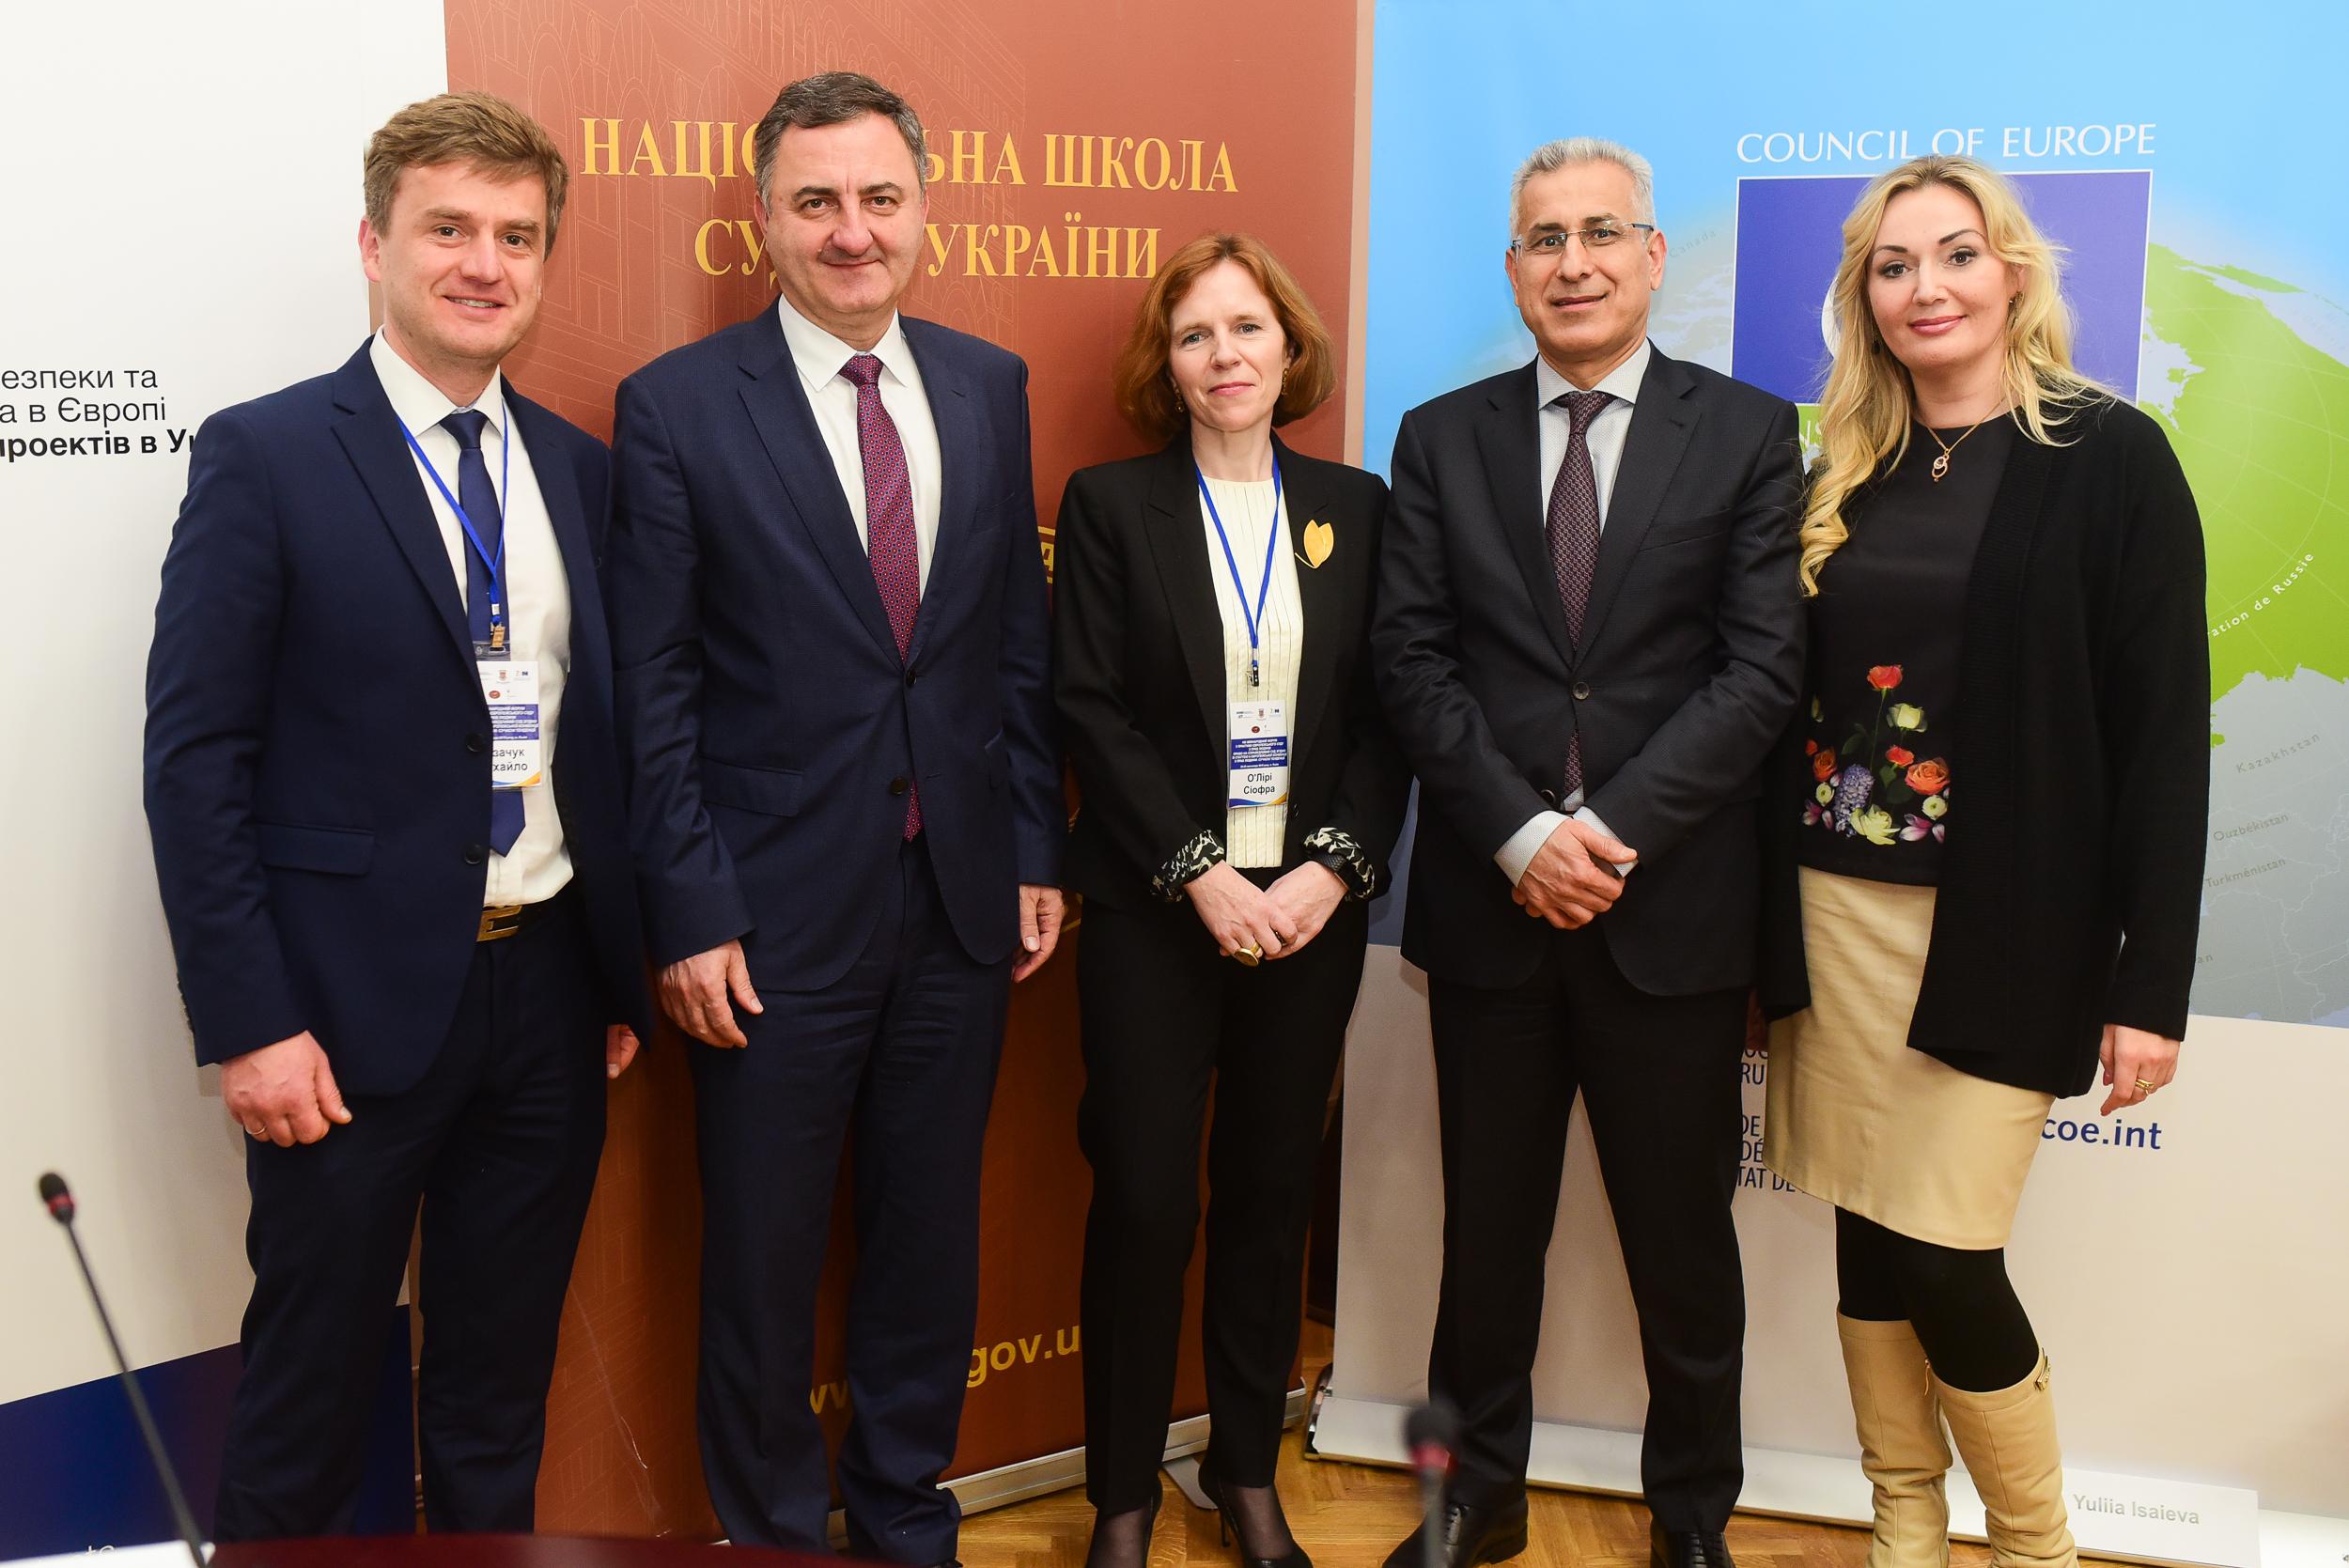 Адвокат ЄСПЛ Київ